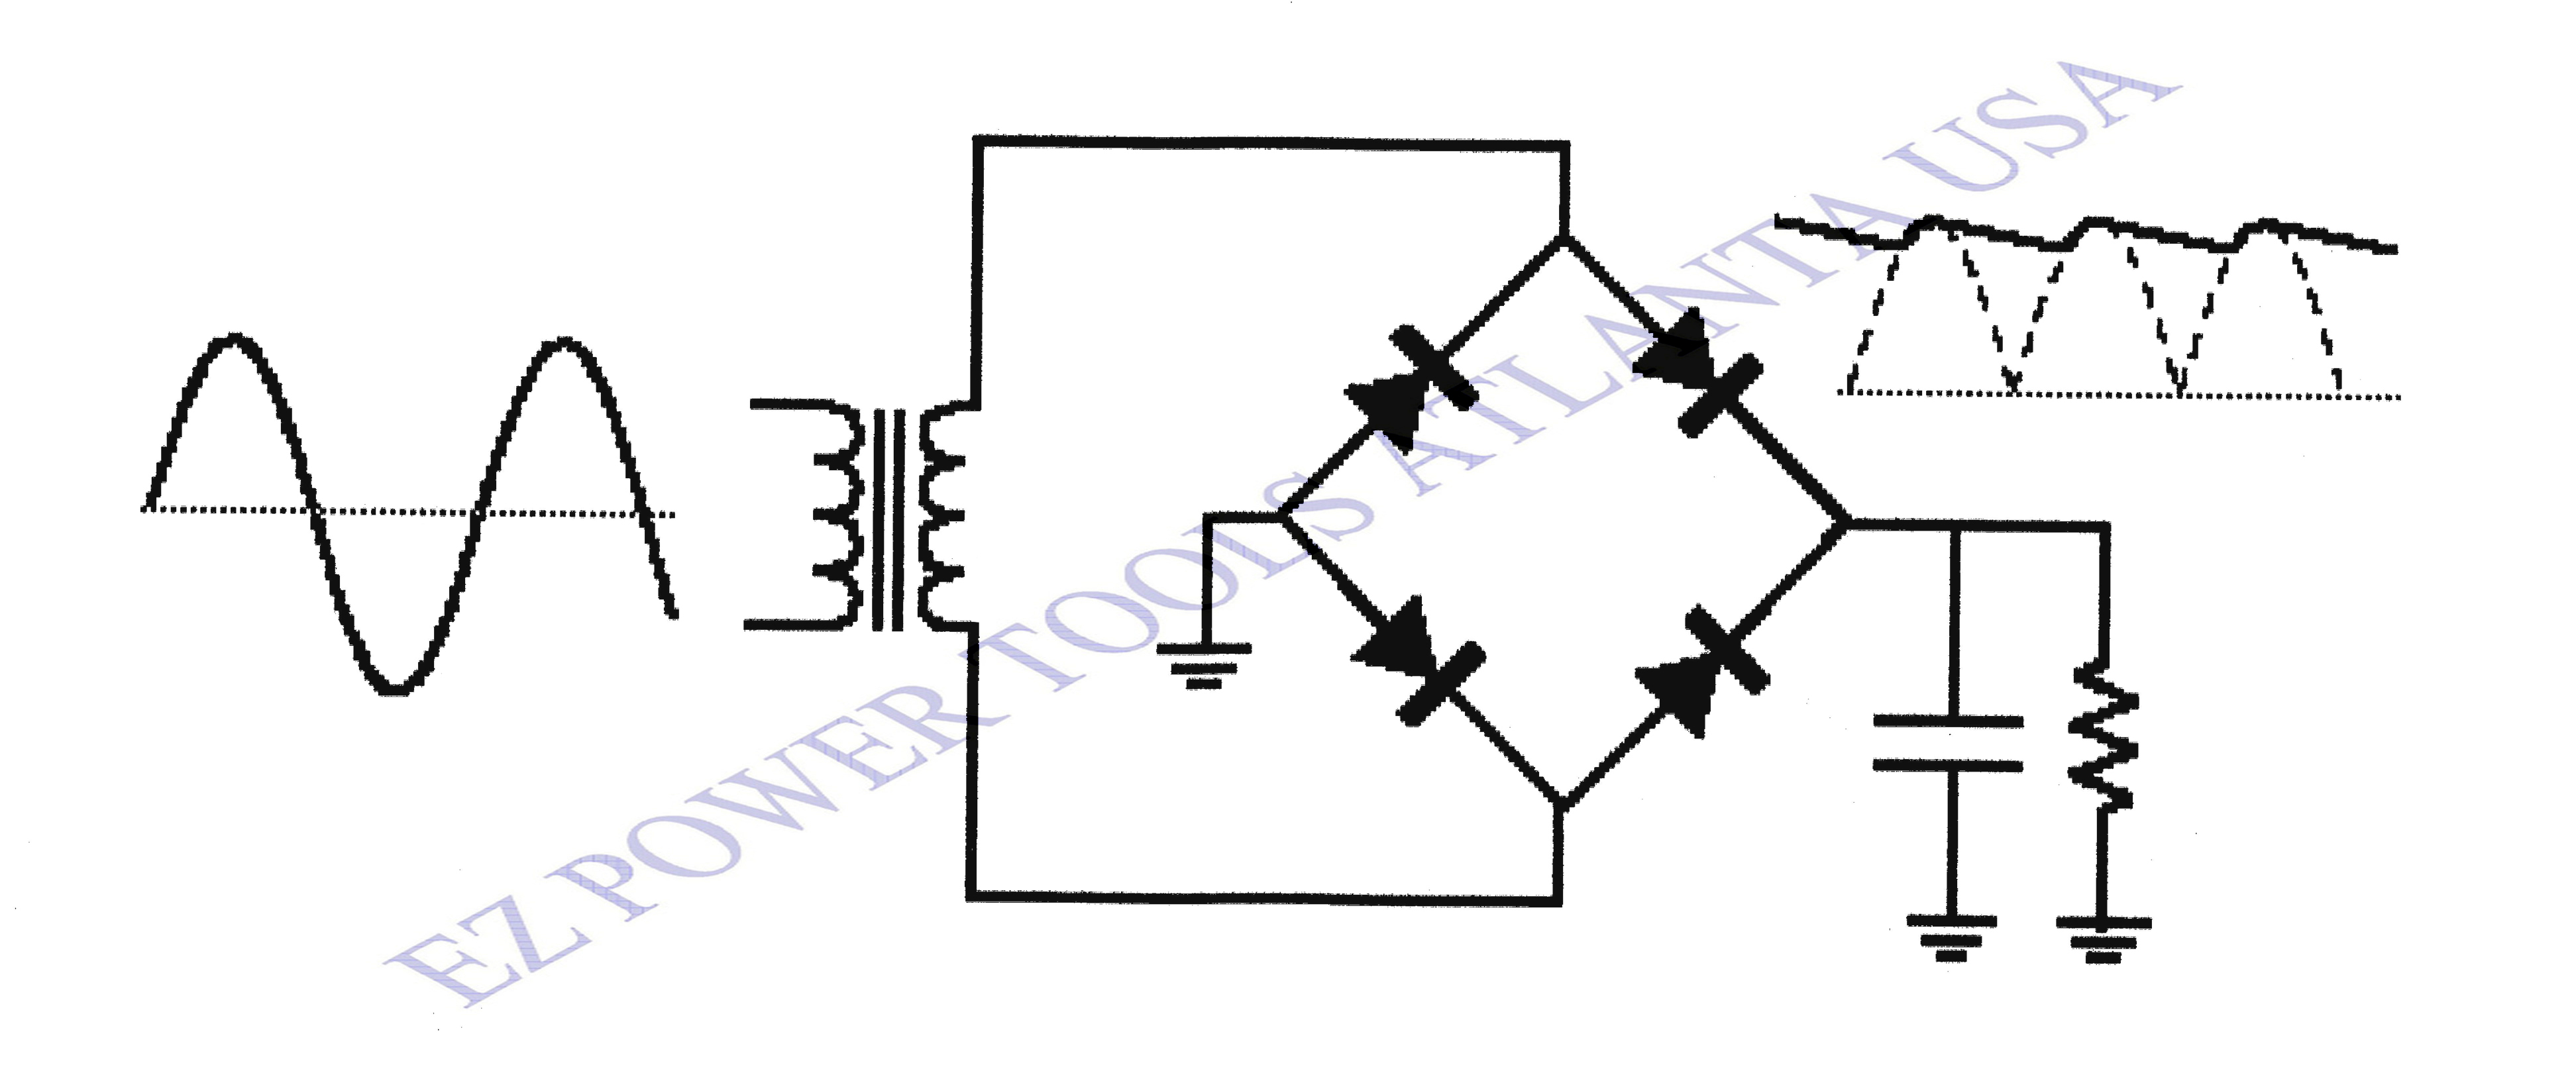 Hdy Lx Hdy Lxb Hdy Lxb Hdy Lxb Generator 12v Dc Voltage Regulator